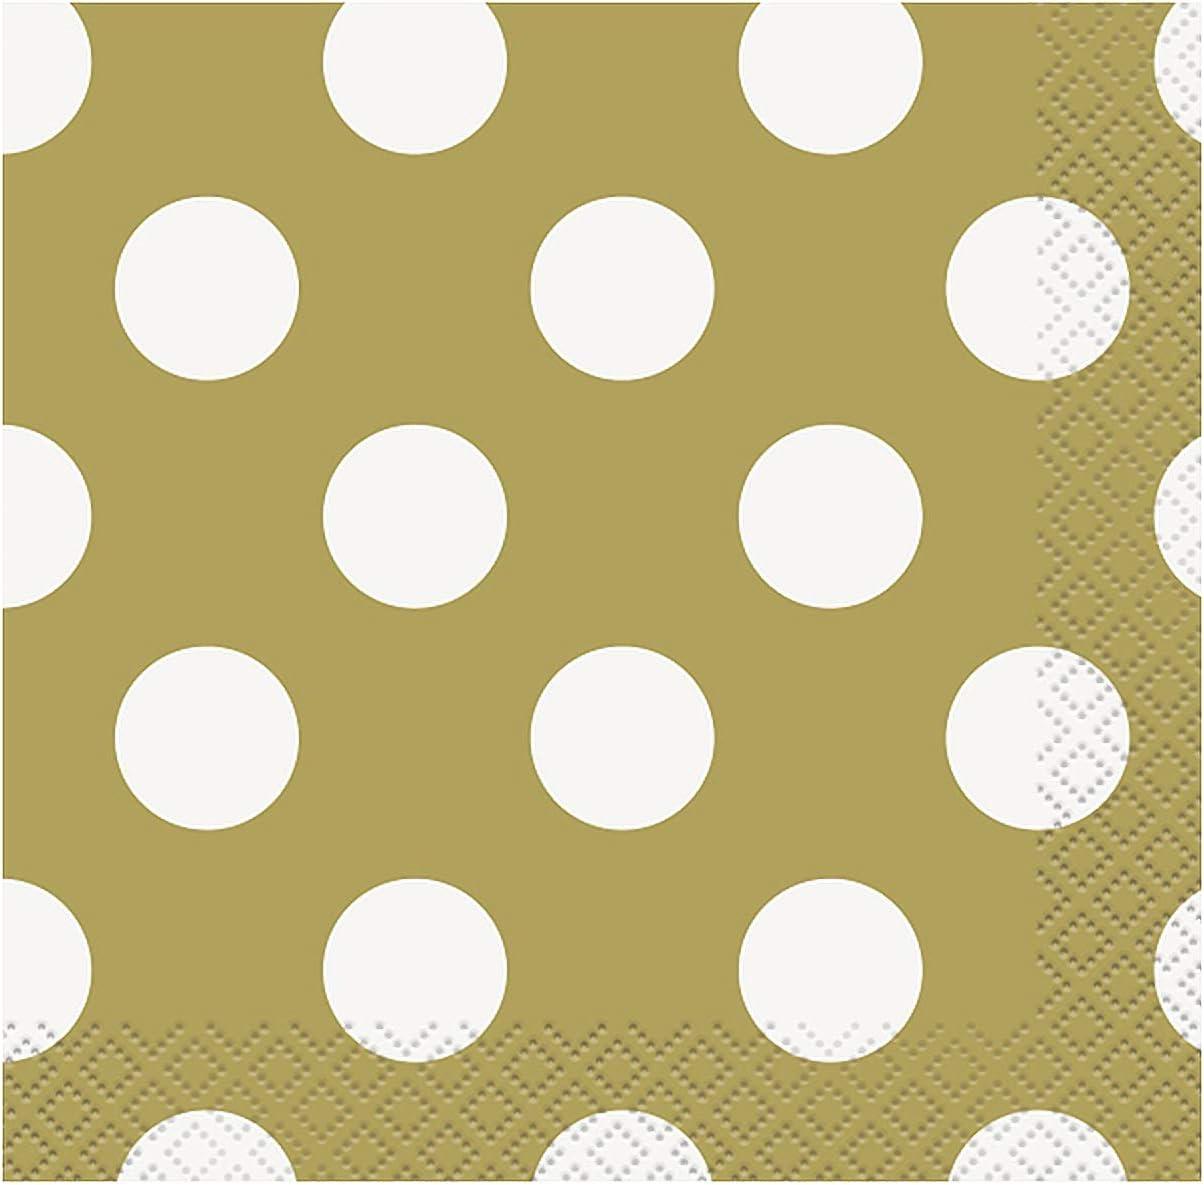 Gold Polka Dot Beverage Napkins, 16ct